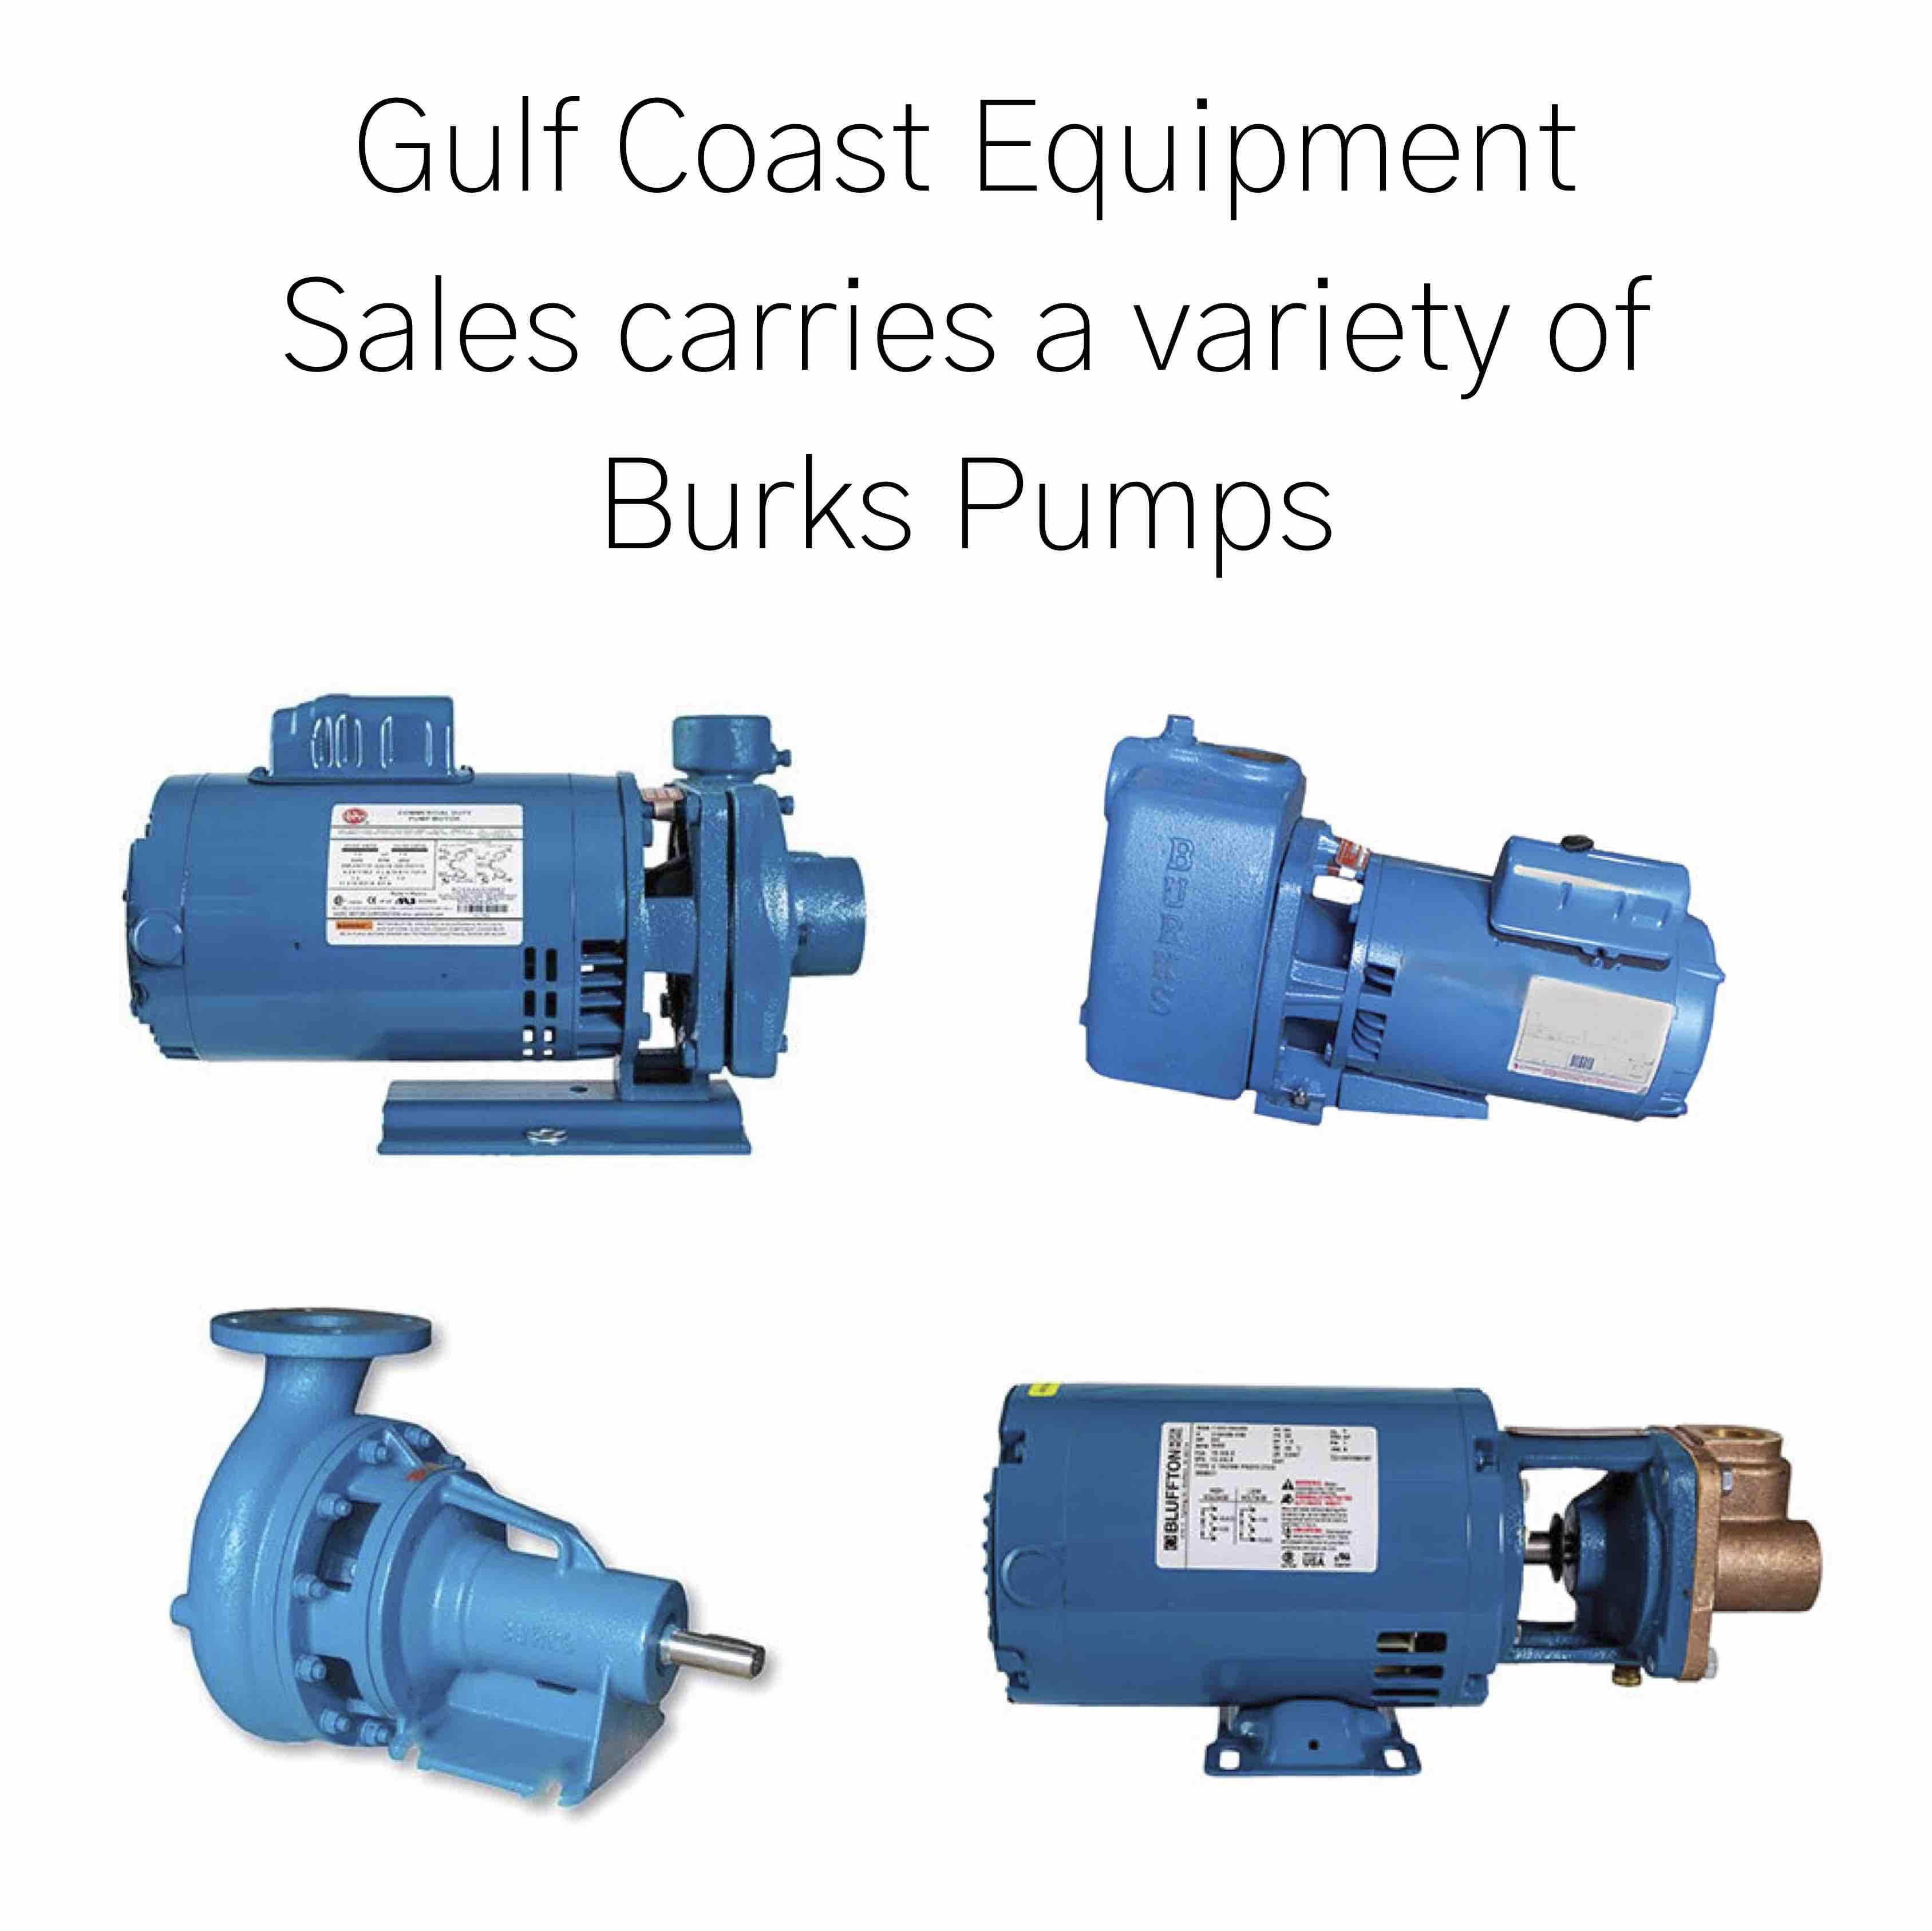 gulf coast equipment sales burks pumps blue